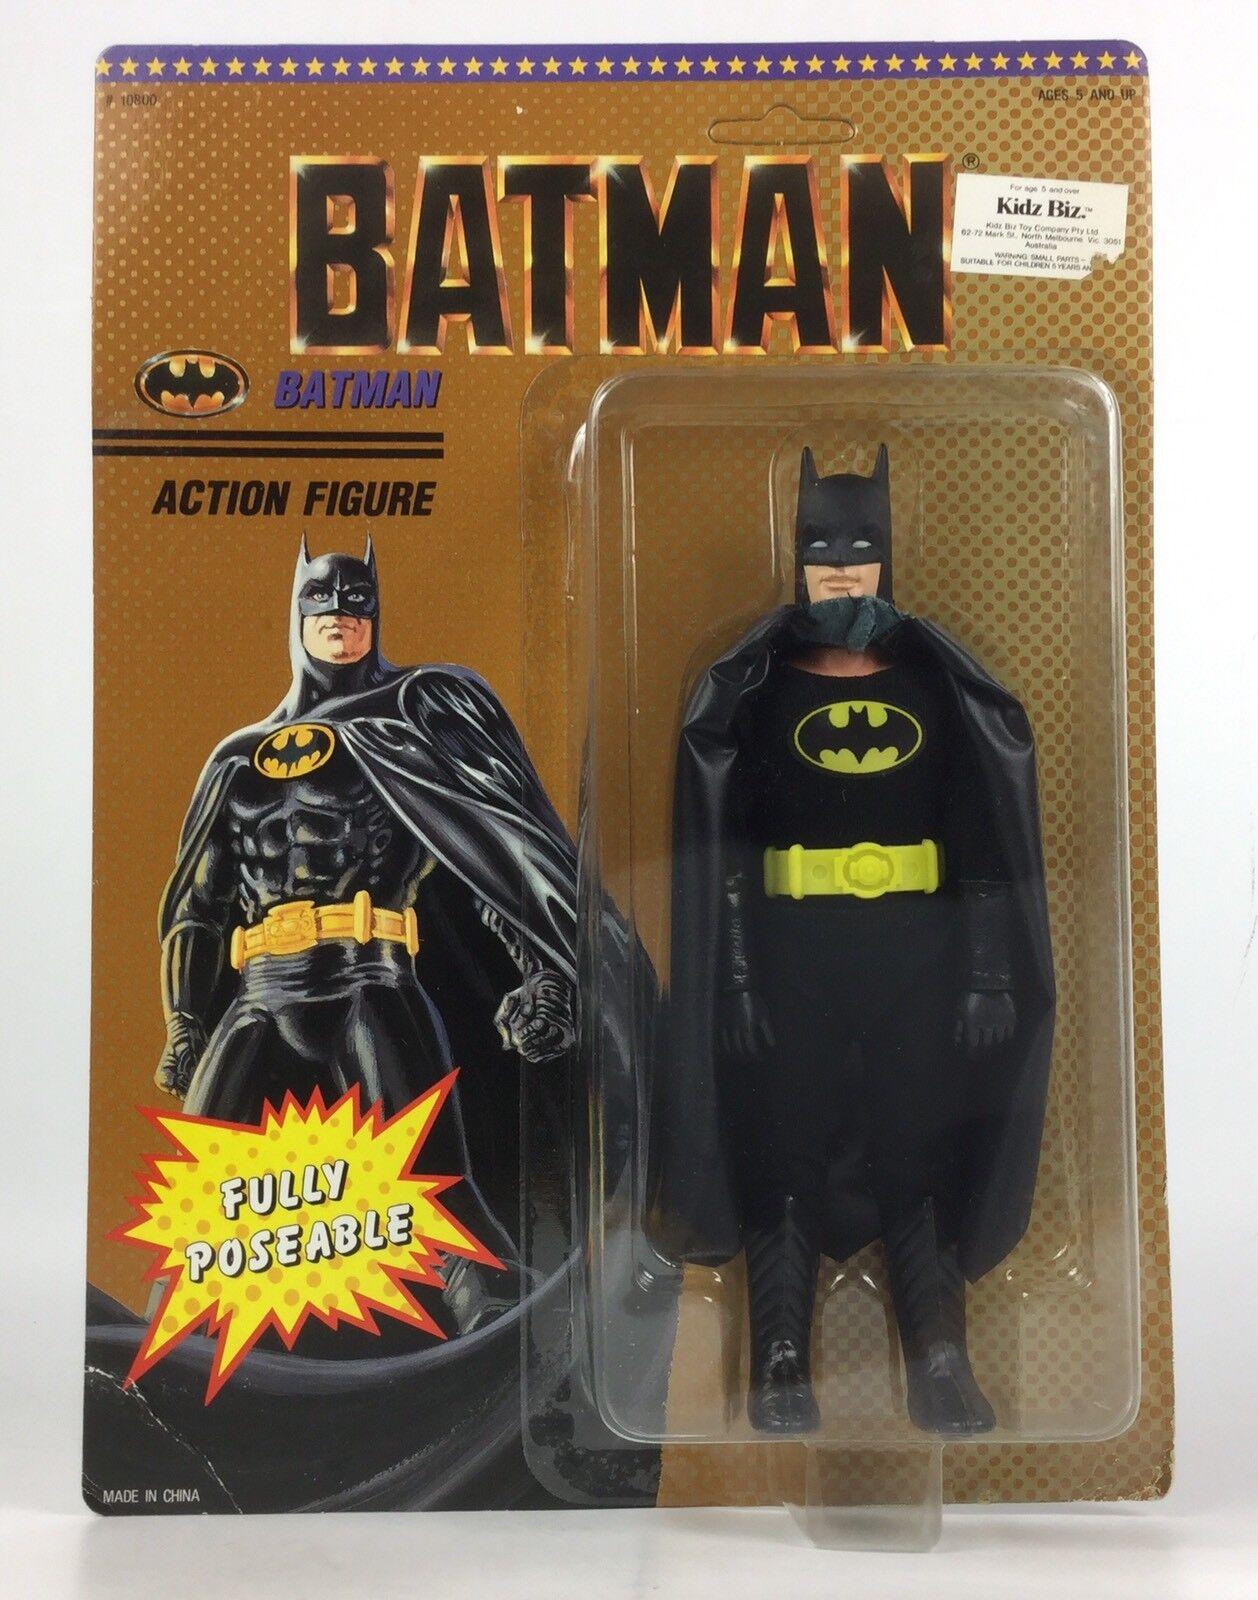 Película de Batman 1989 Raro Australiano exclusivo 8  figura, Kidz Biz, (Mego como) MOC